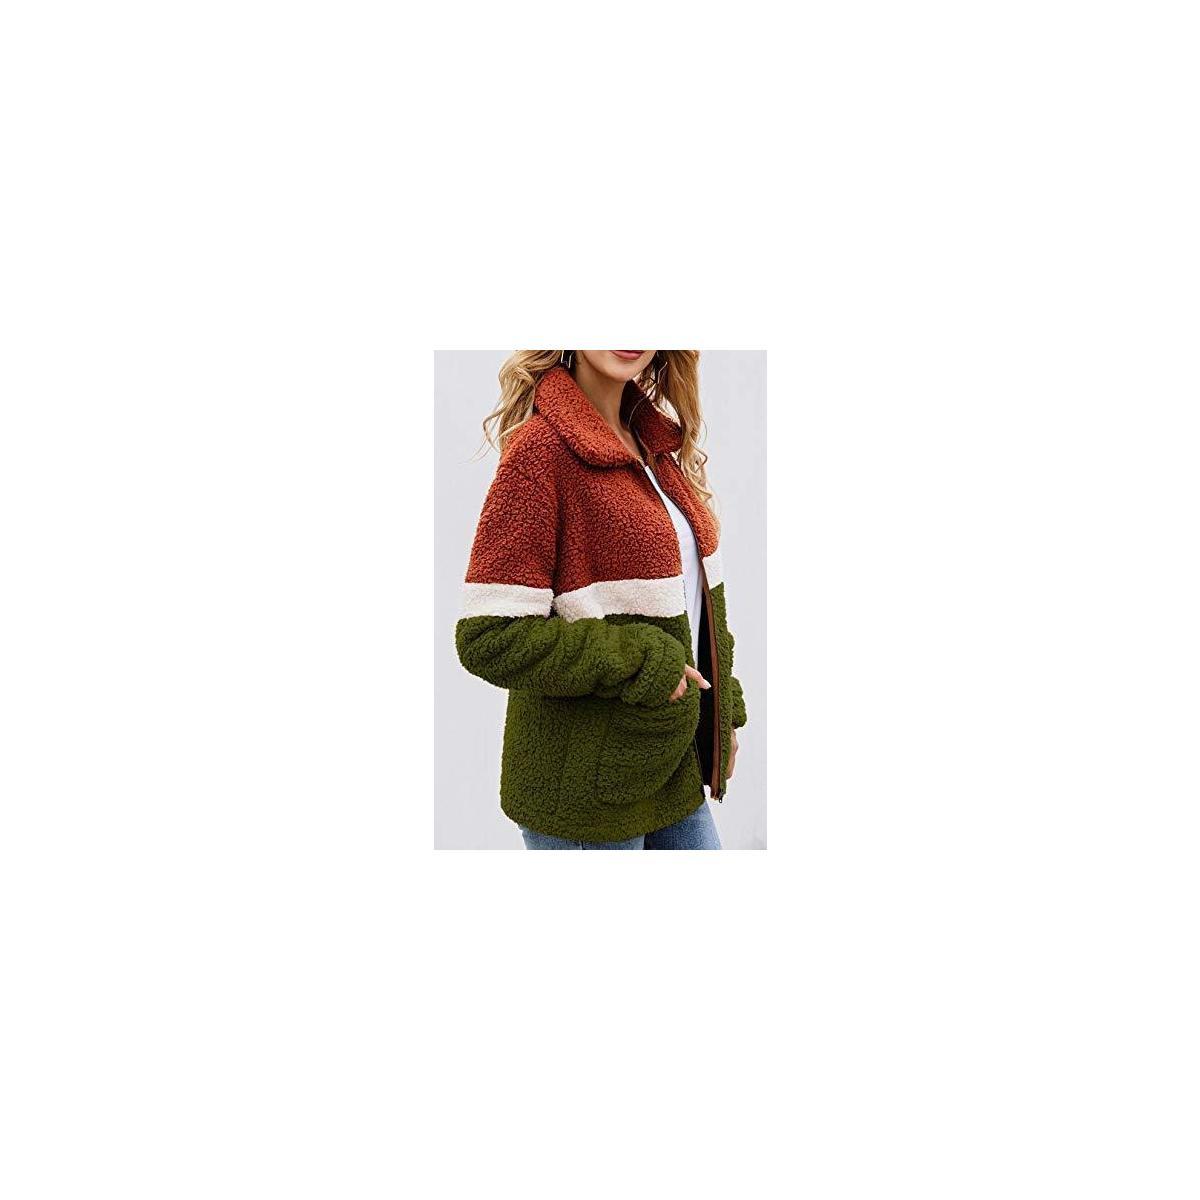 Womens Faux Fur Fleece Sherpa Fluffy Zipper Long Sleeve Open Front Coat Contrast Color Block Outwear with Pockets Army